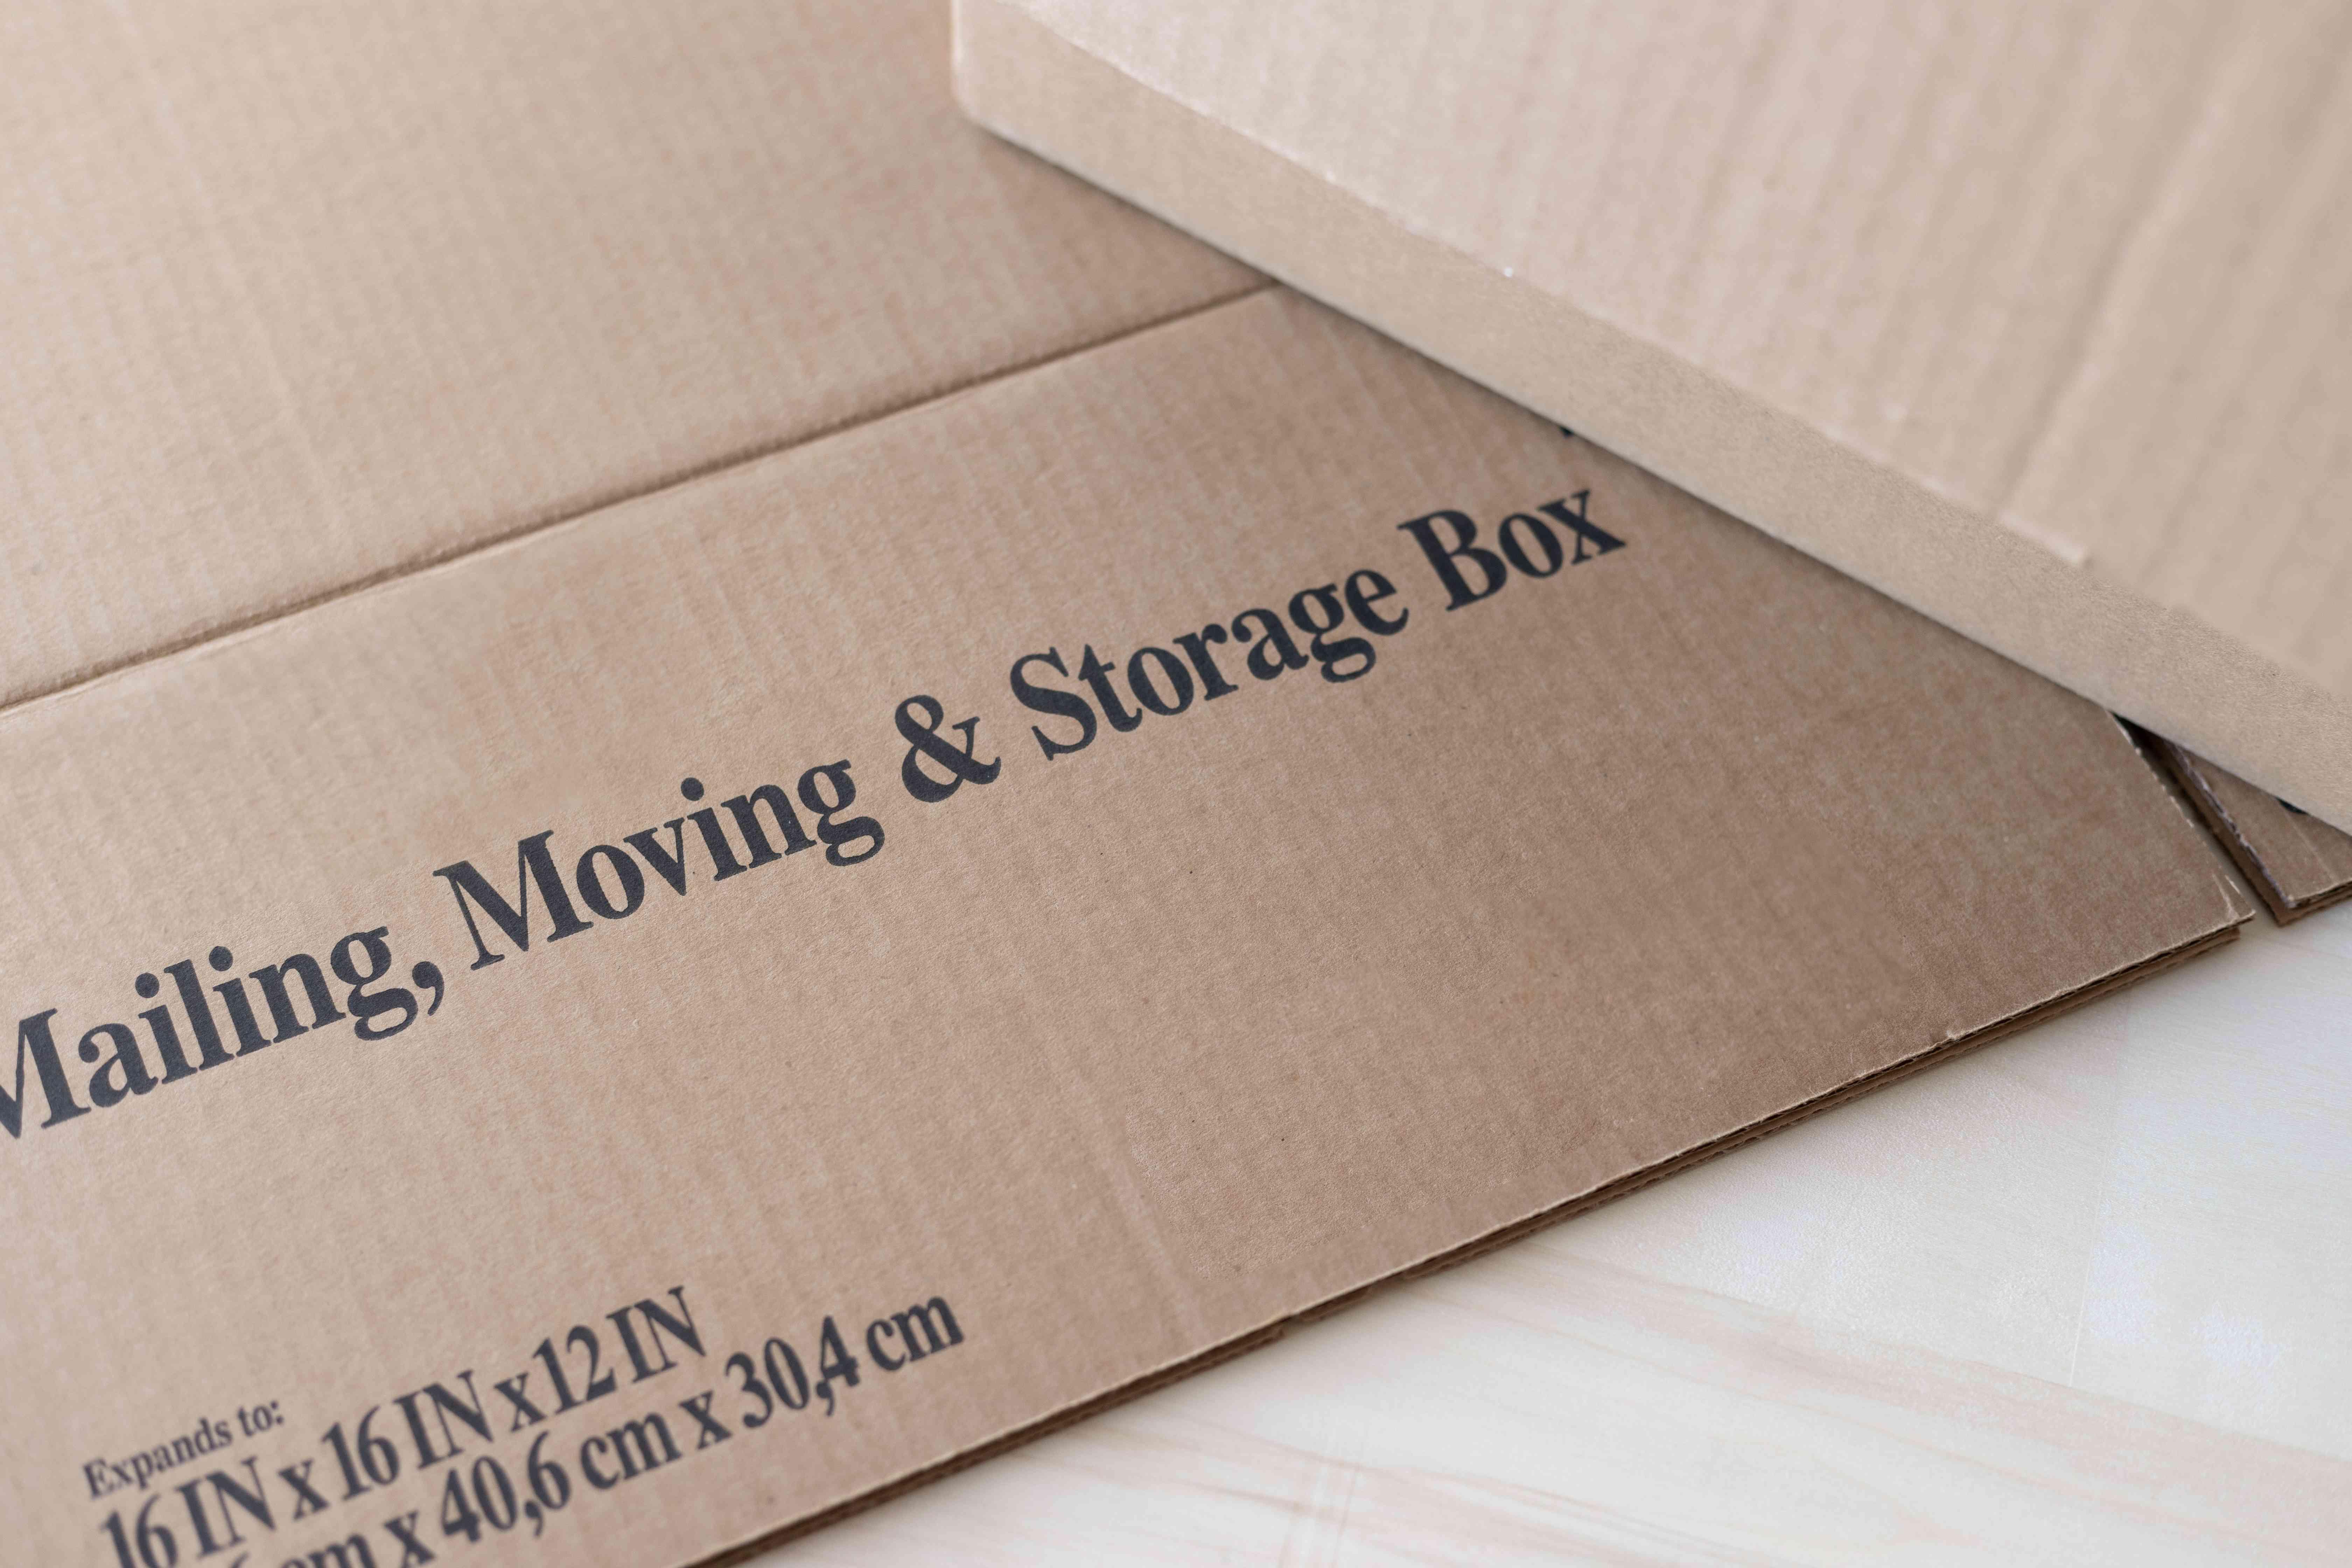 Cardboard box with moving box label closeup